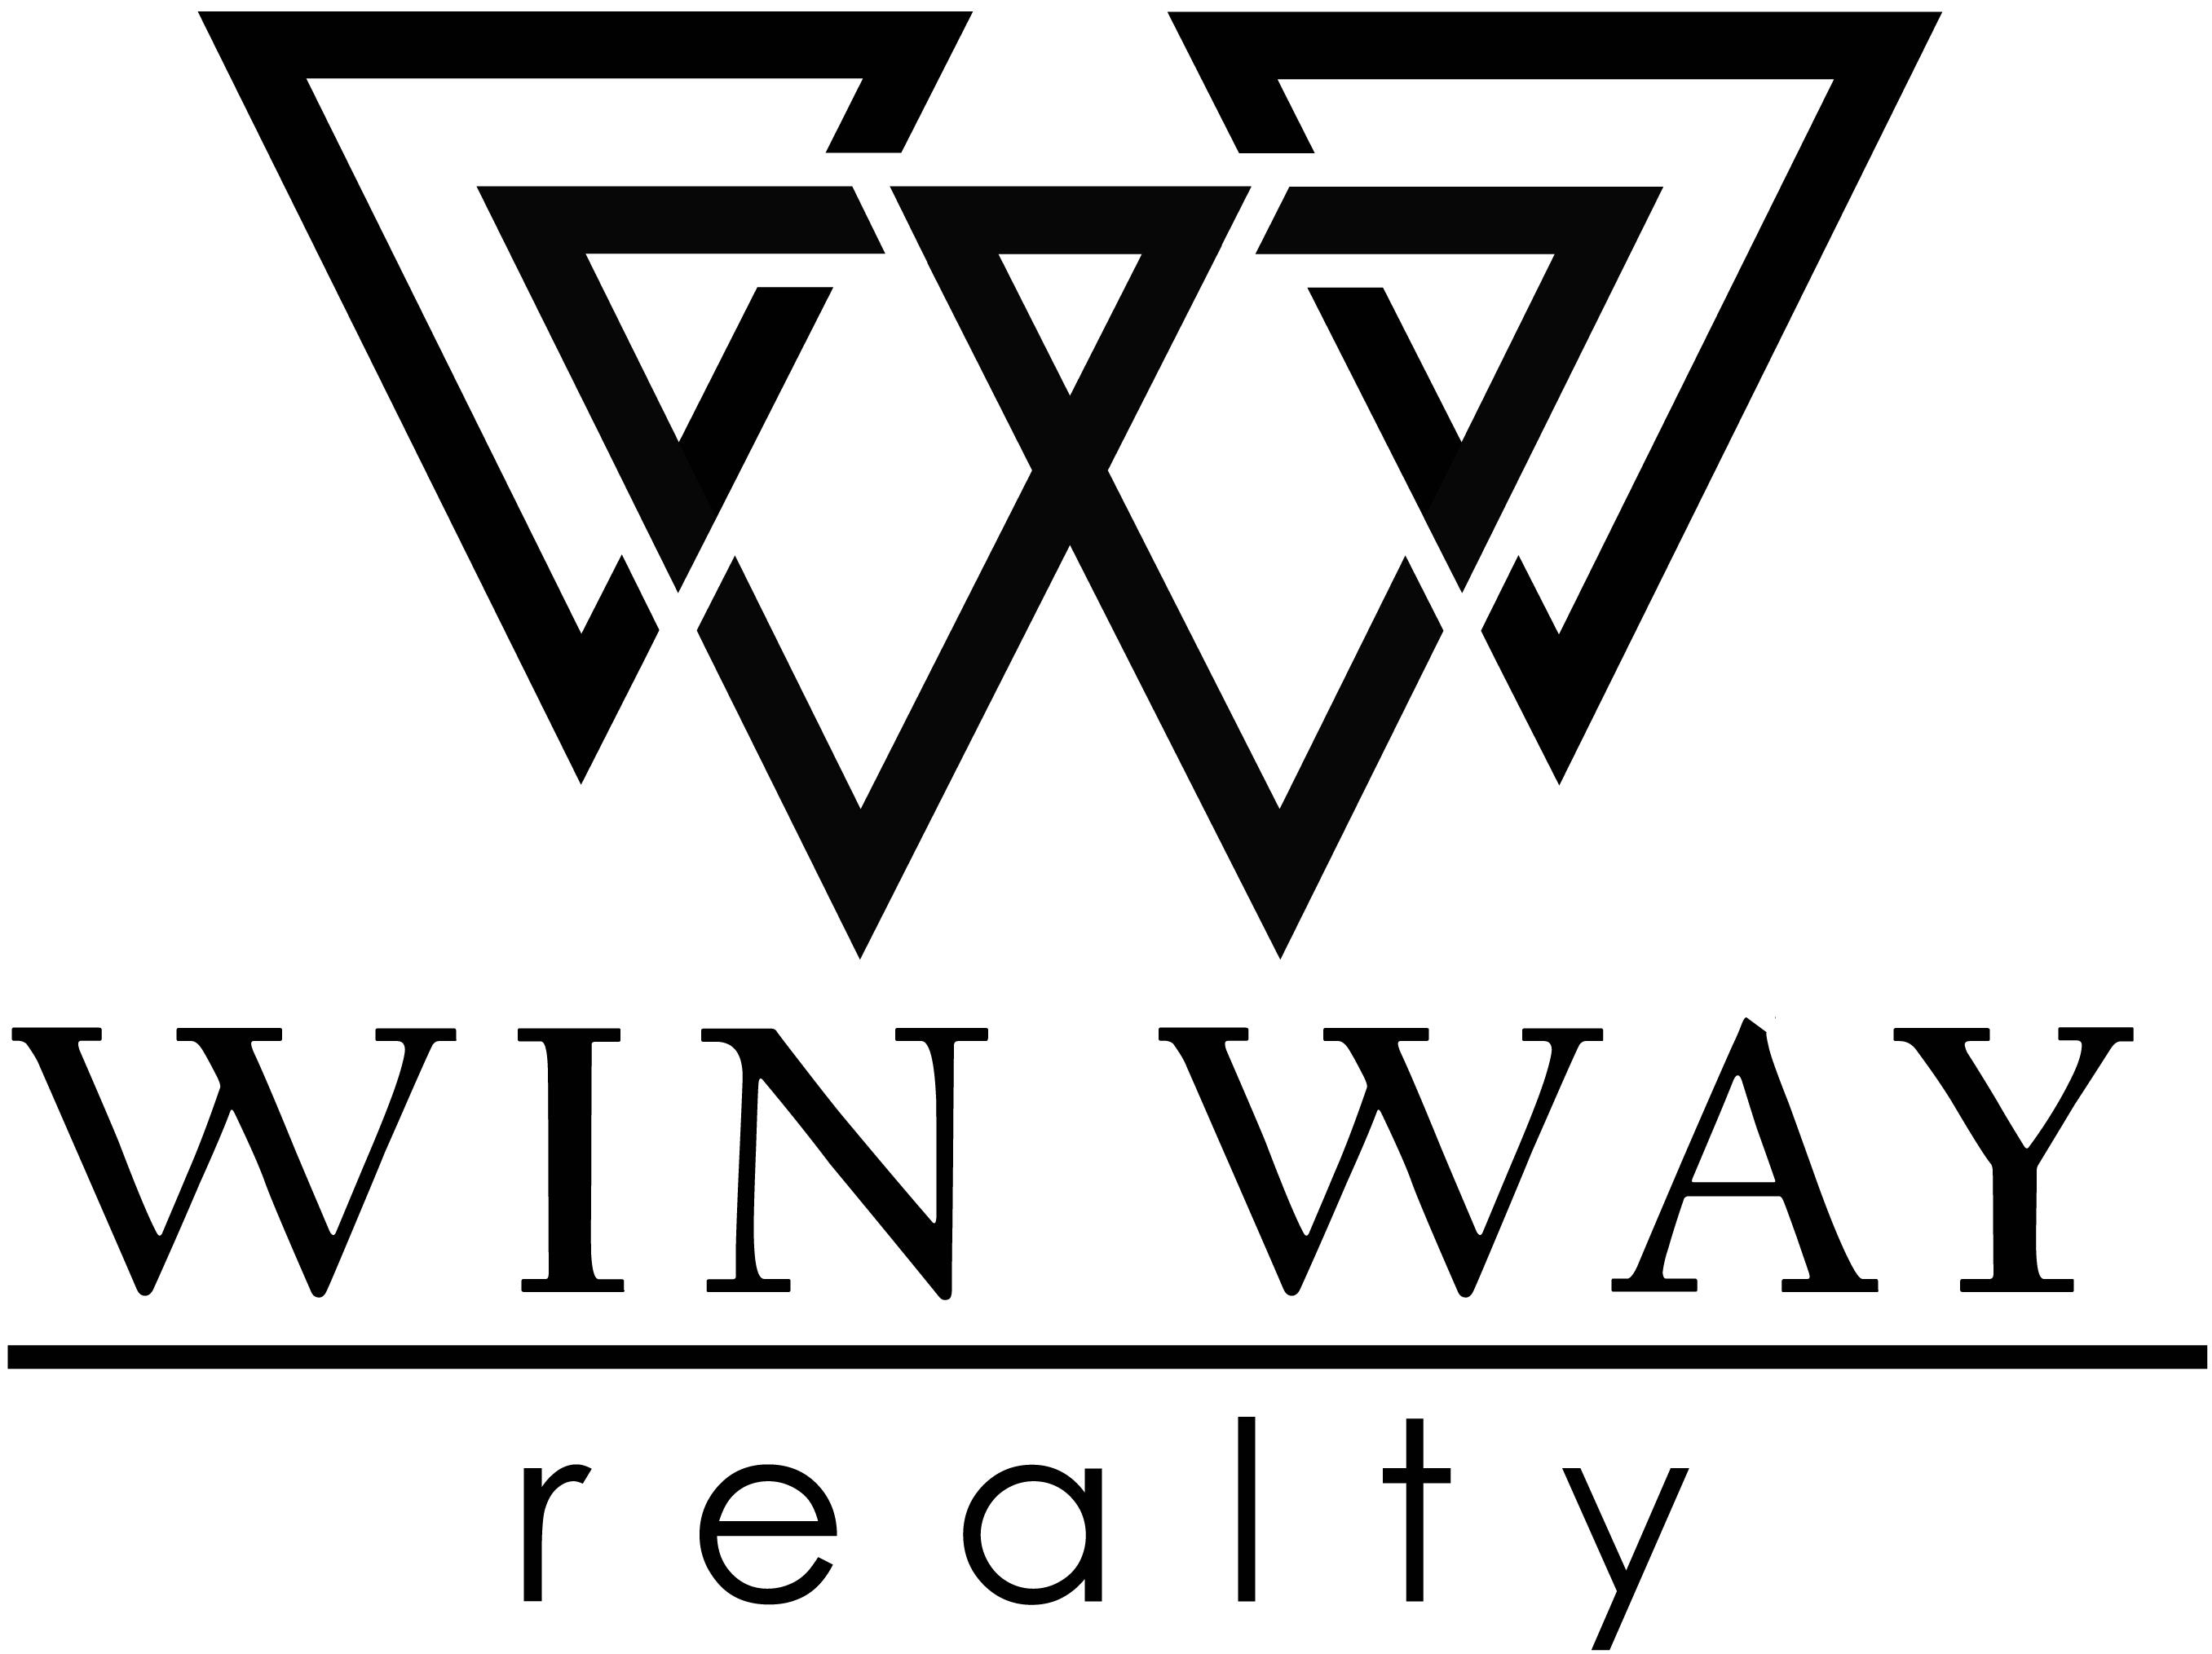 Логотип для агентства недвижимости фото f_3625aa998599017d.jpg